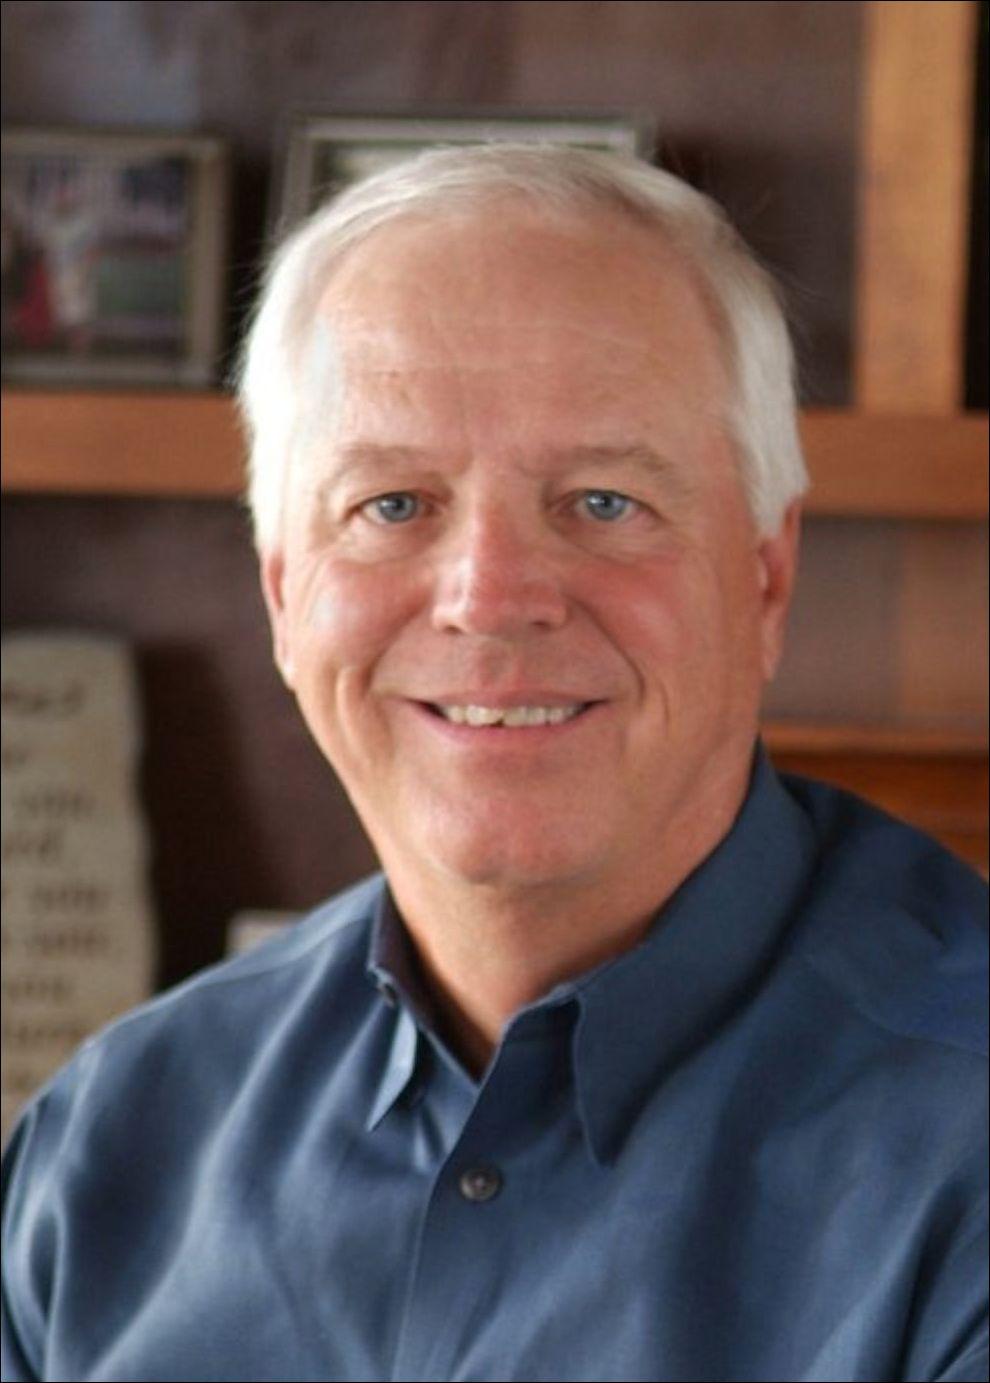 David Cottrell Leadership Speaker